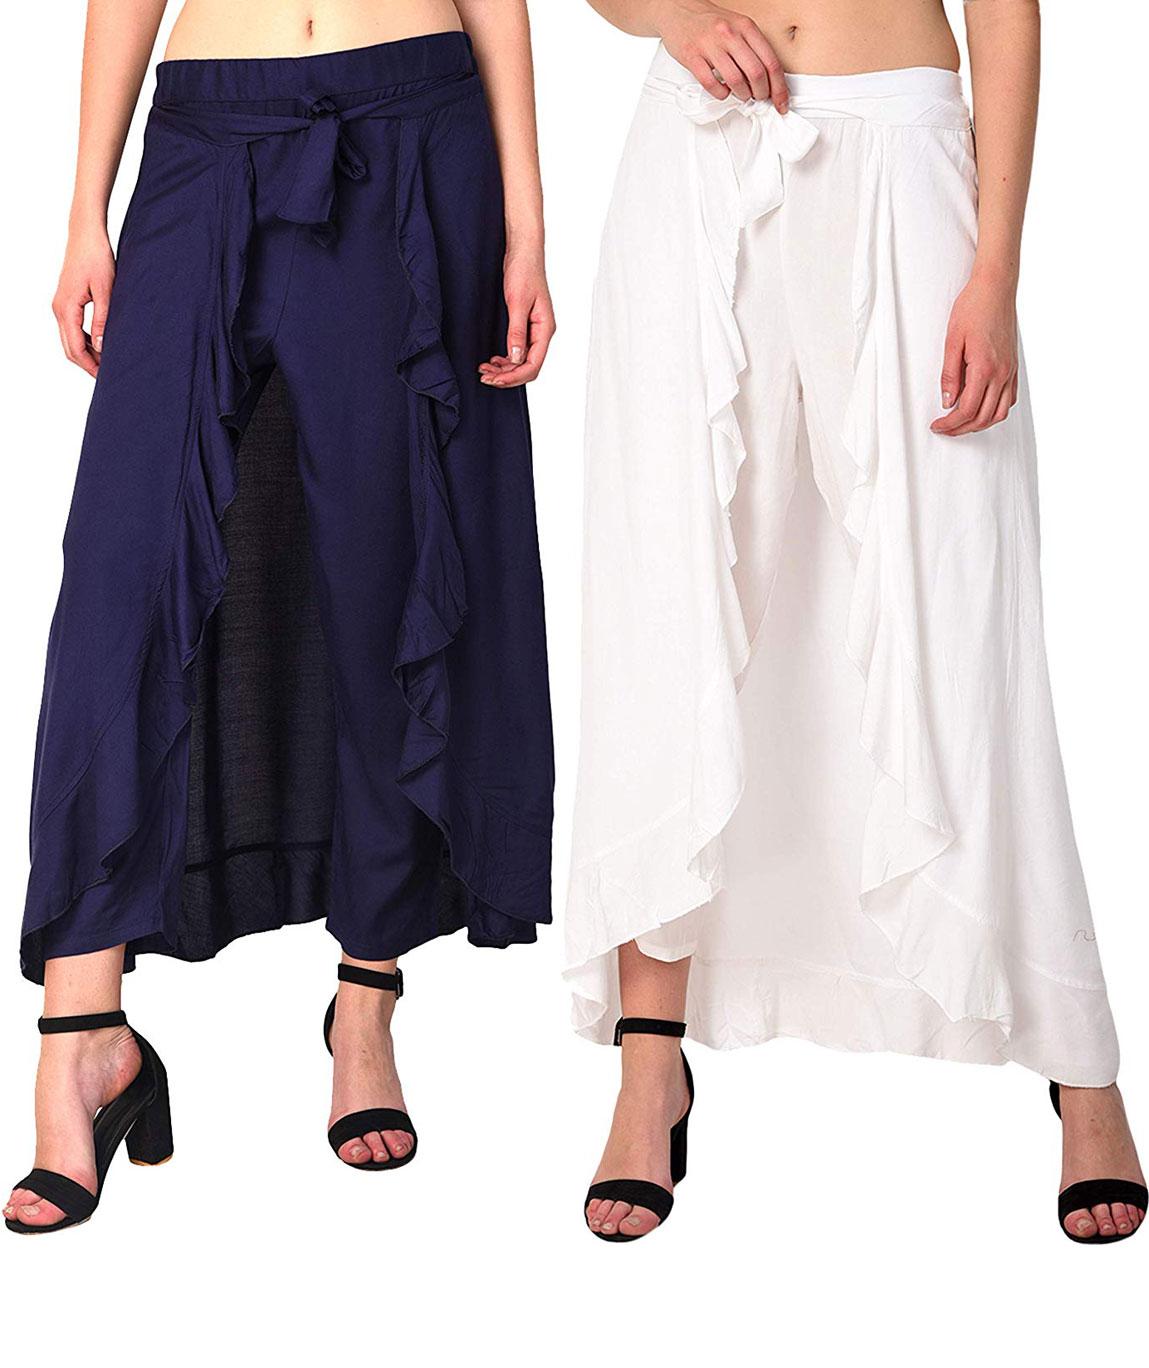 Women`s Rayon Flared Ruffle Palazzo (Pack of 2)(navy blue &white)